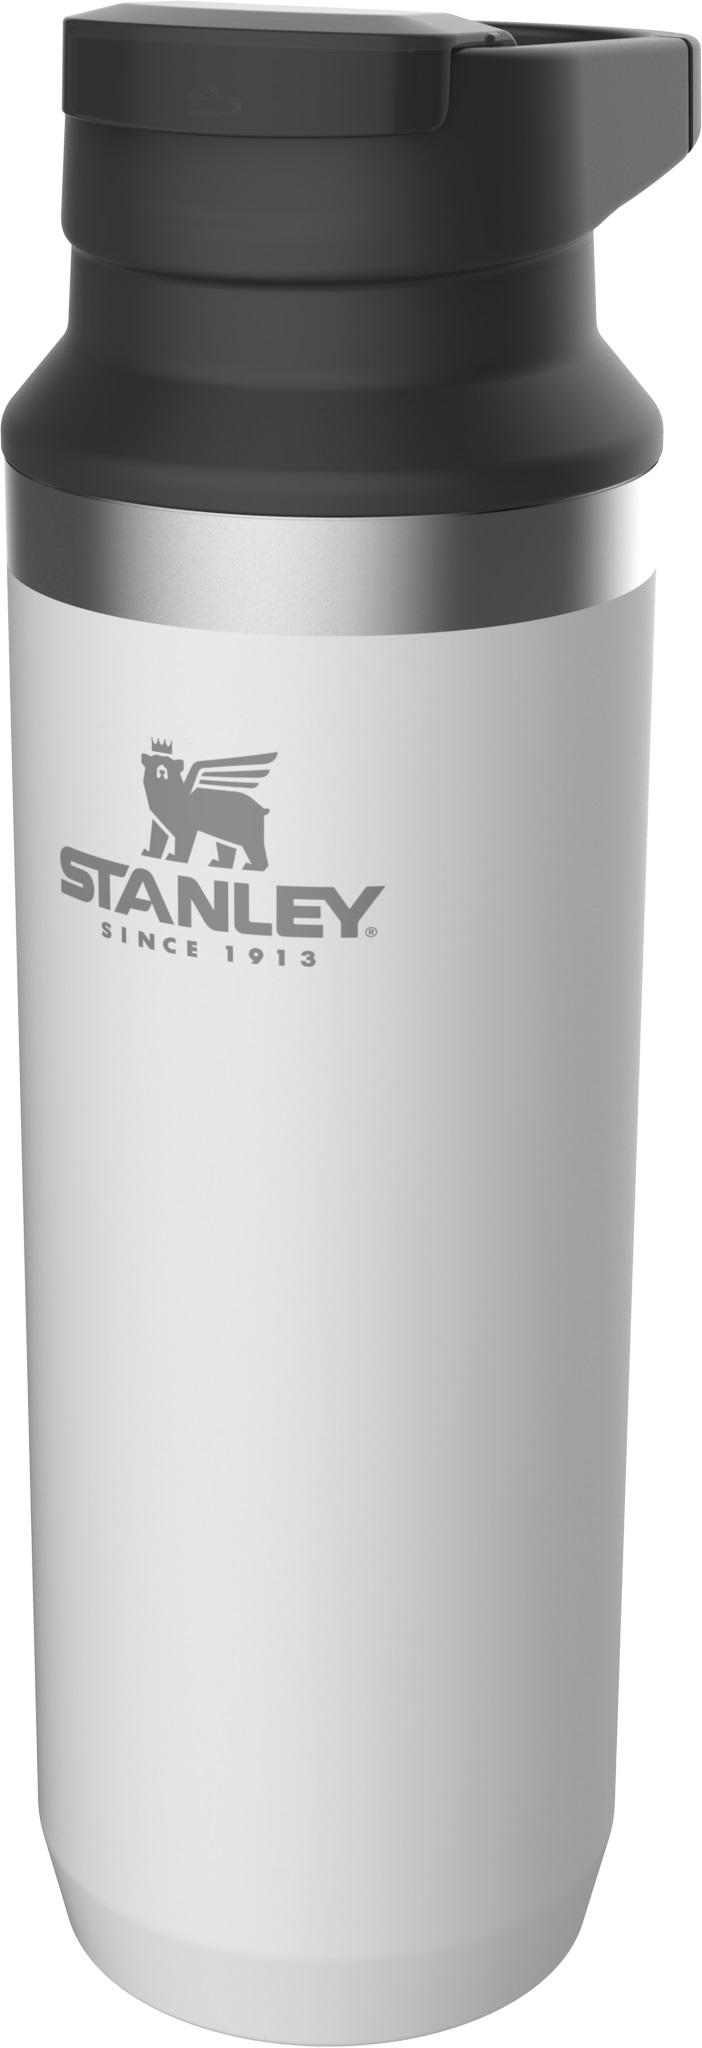 Stanley termokrūze Adventure Vacuum The Switchback Mug 0,47L balta 2802285022 termoss